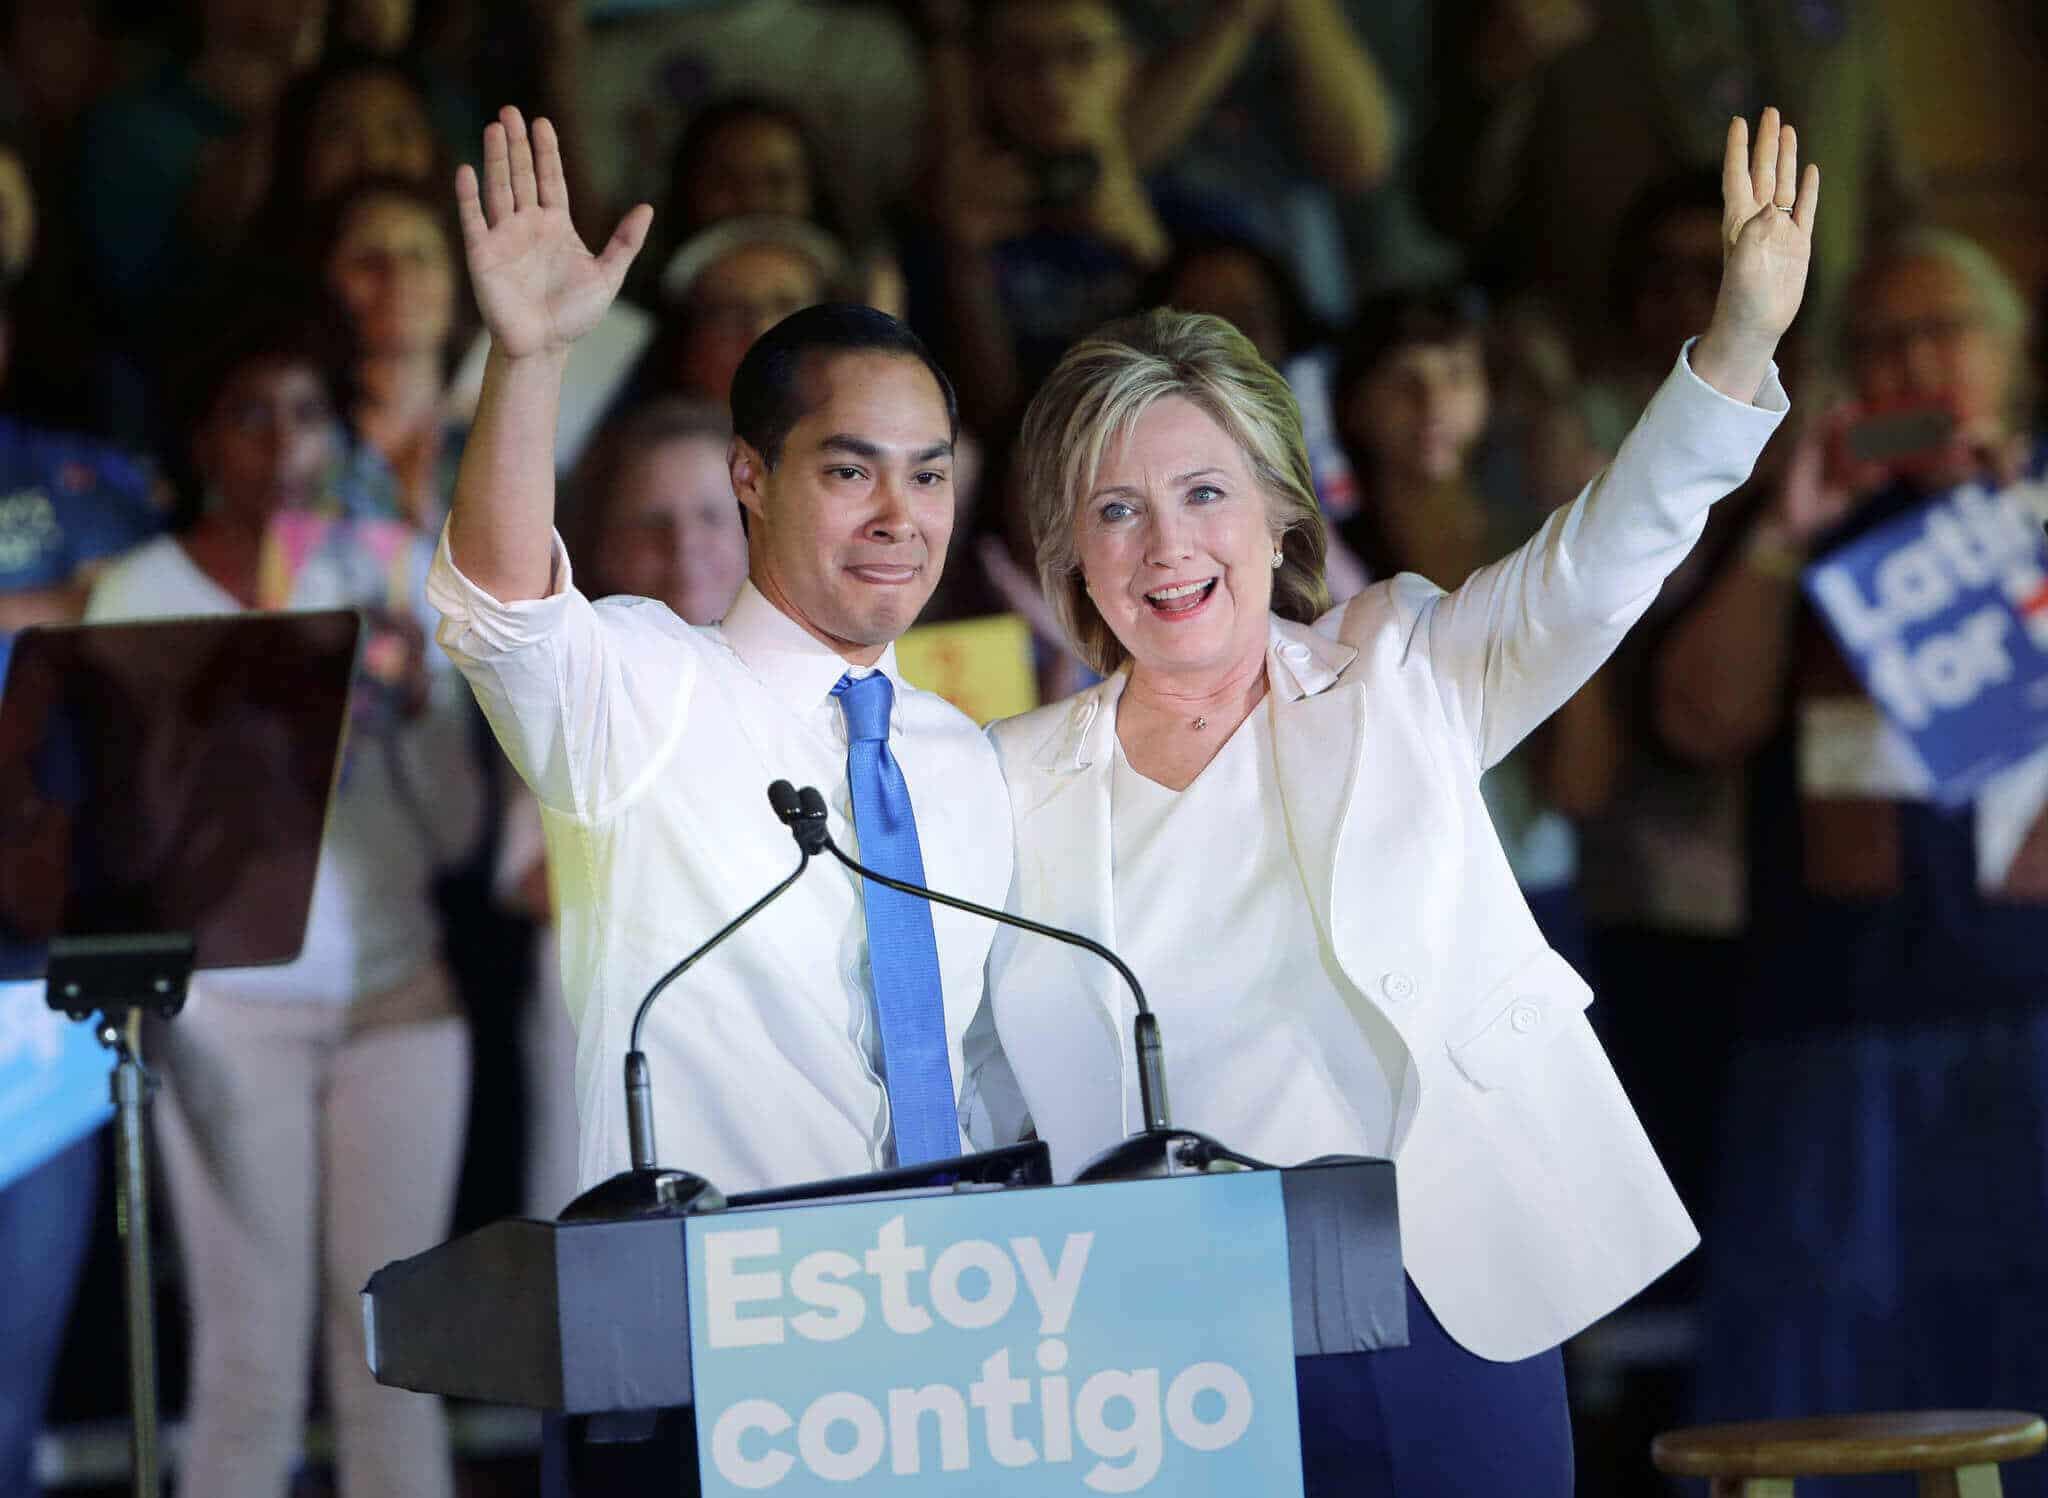 2016 Election: Clinton VP Odds – Julian Castro